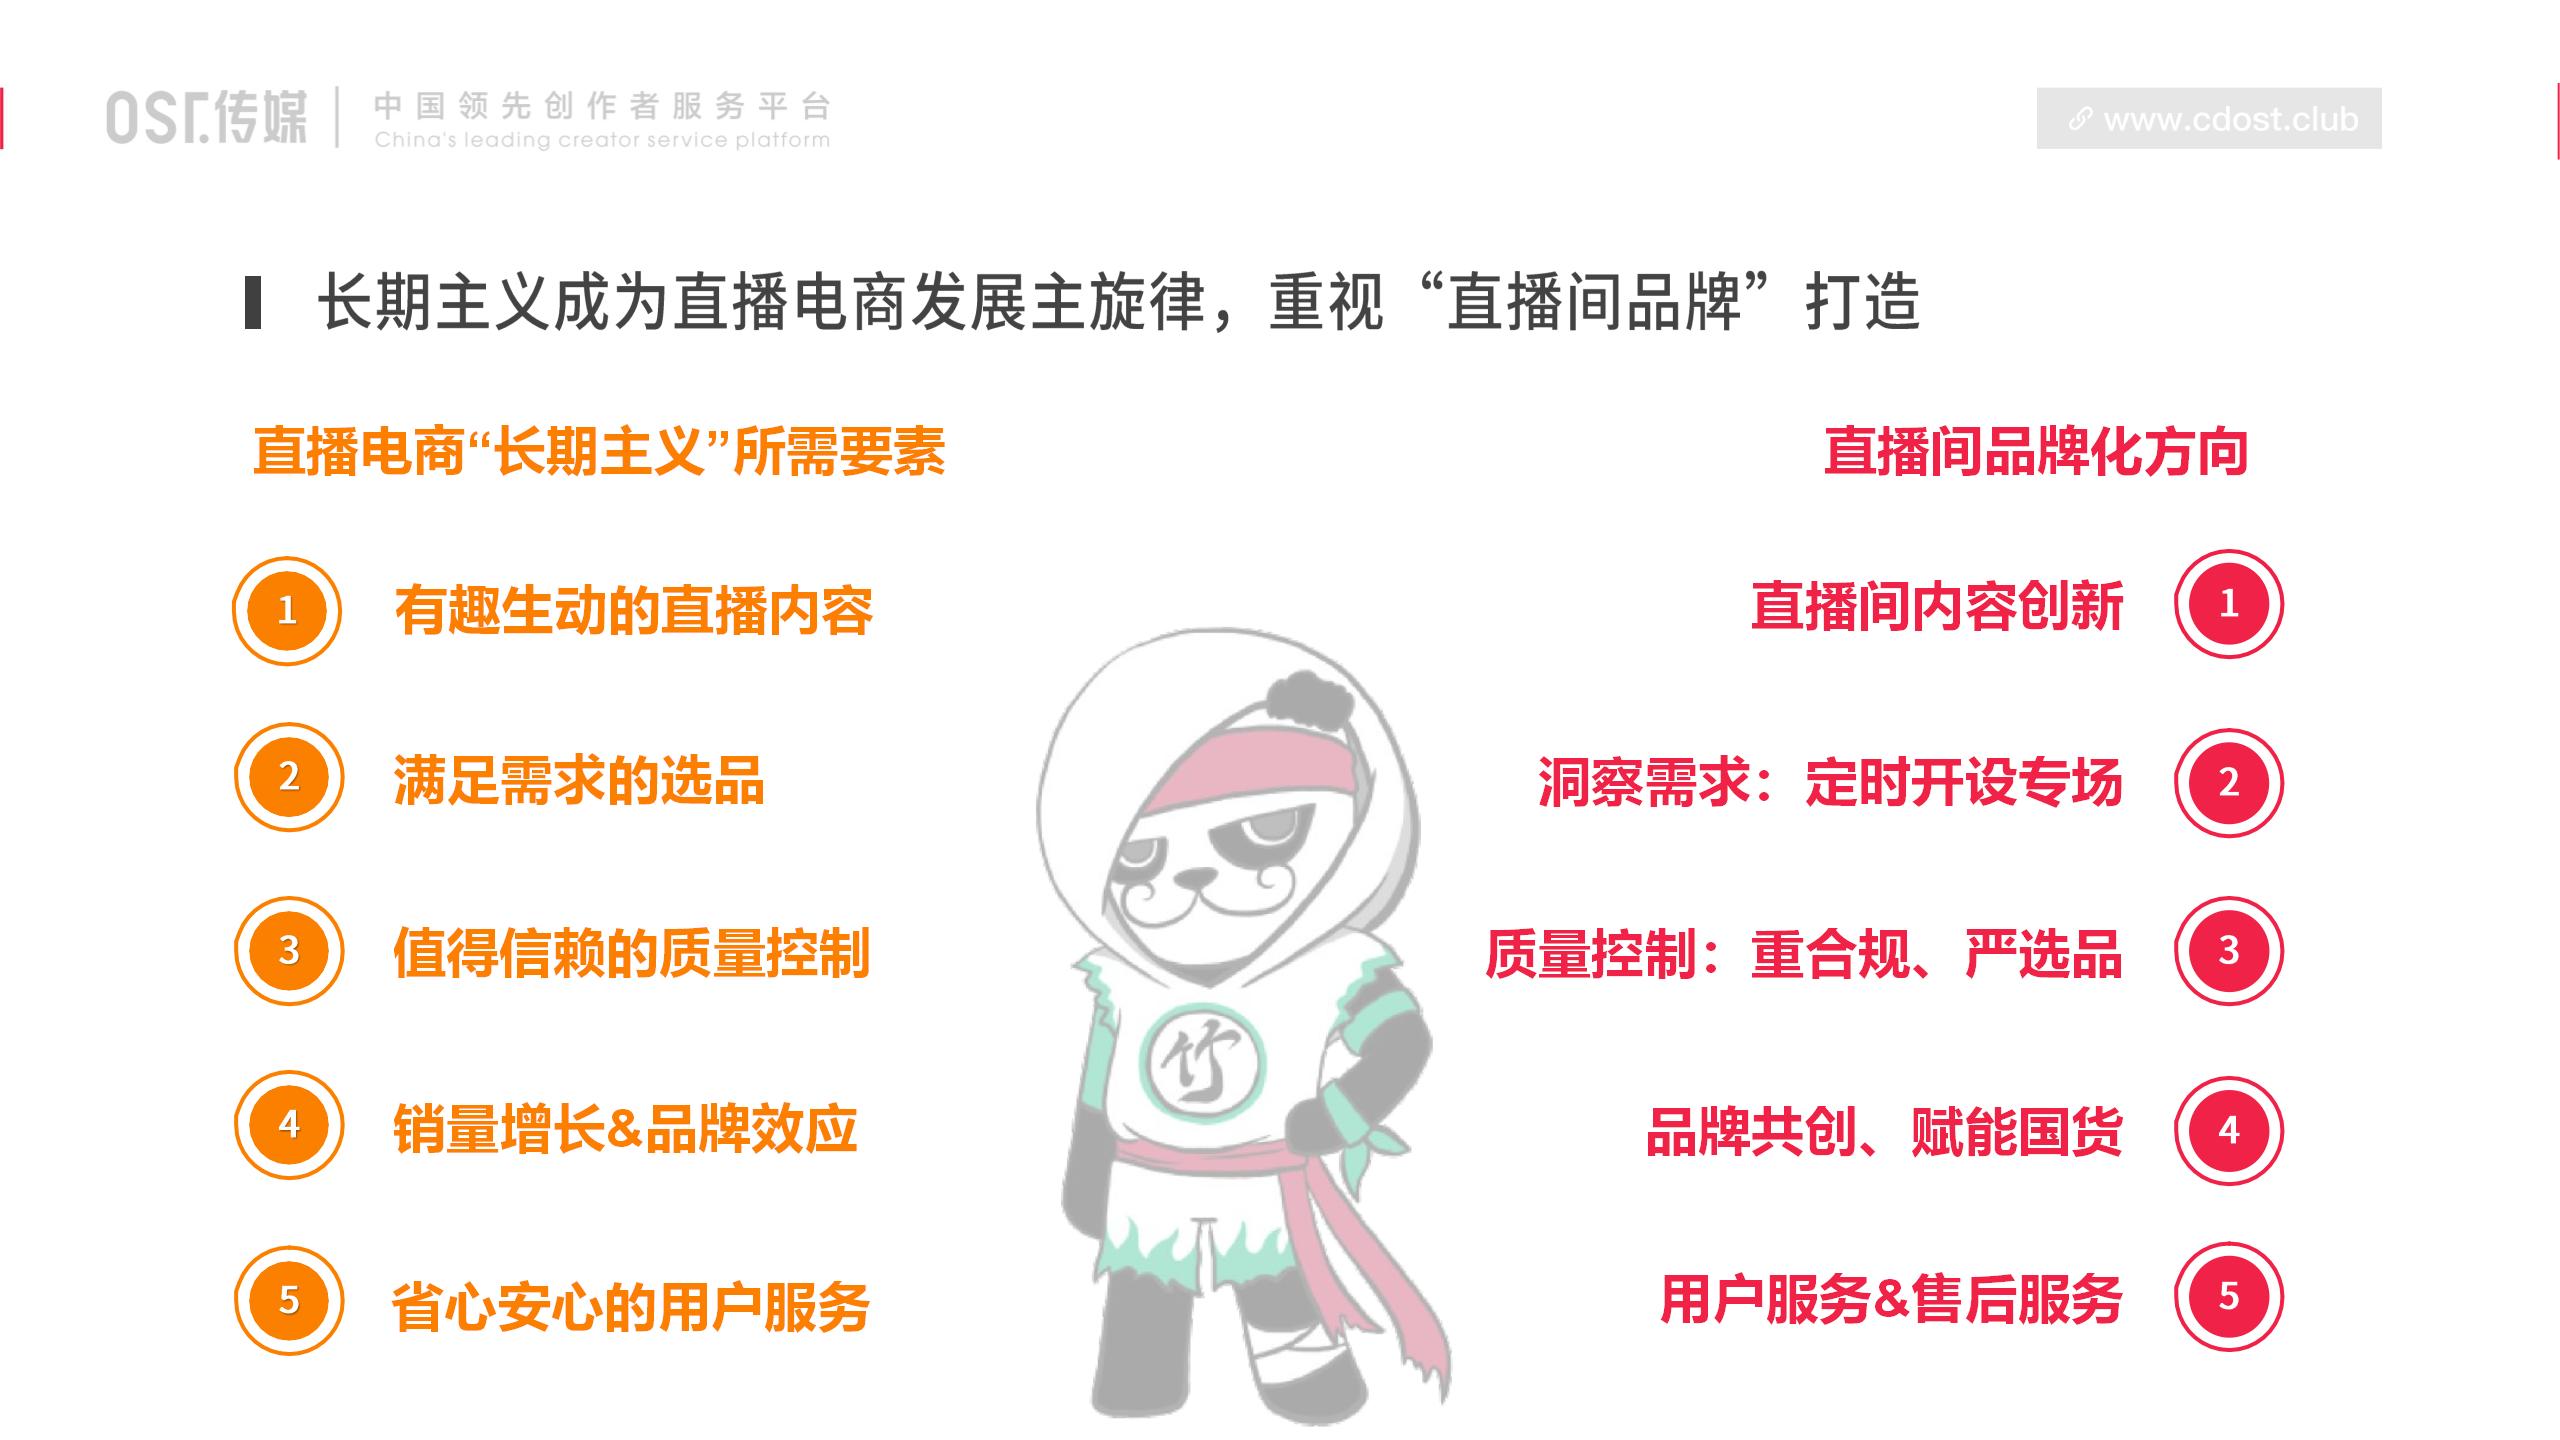 OST传媒电商业务介绍第38张